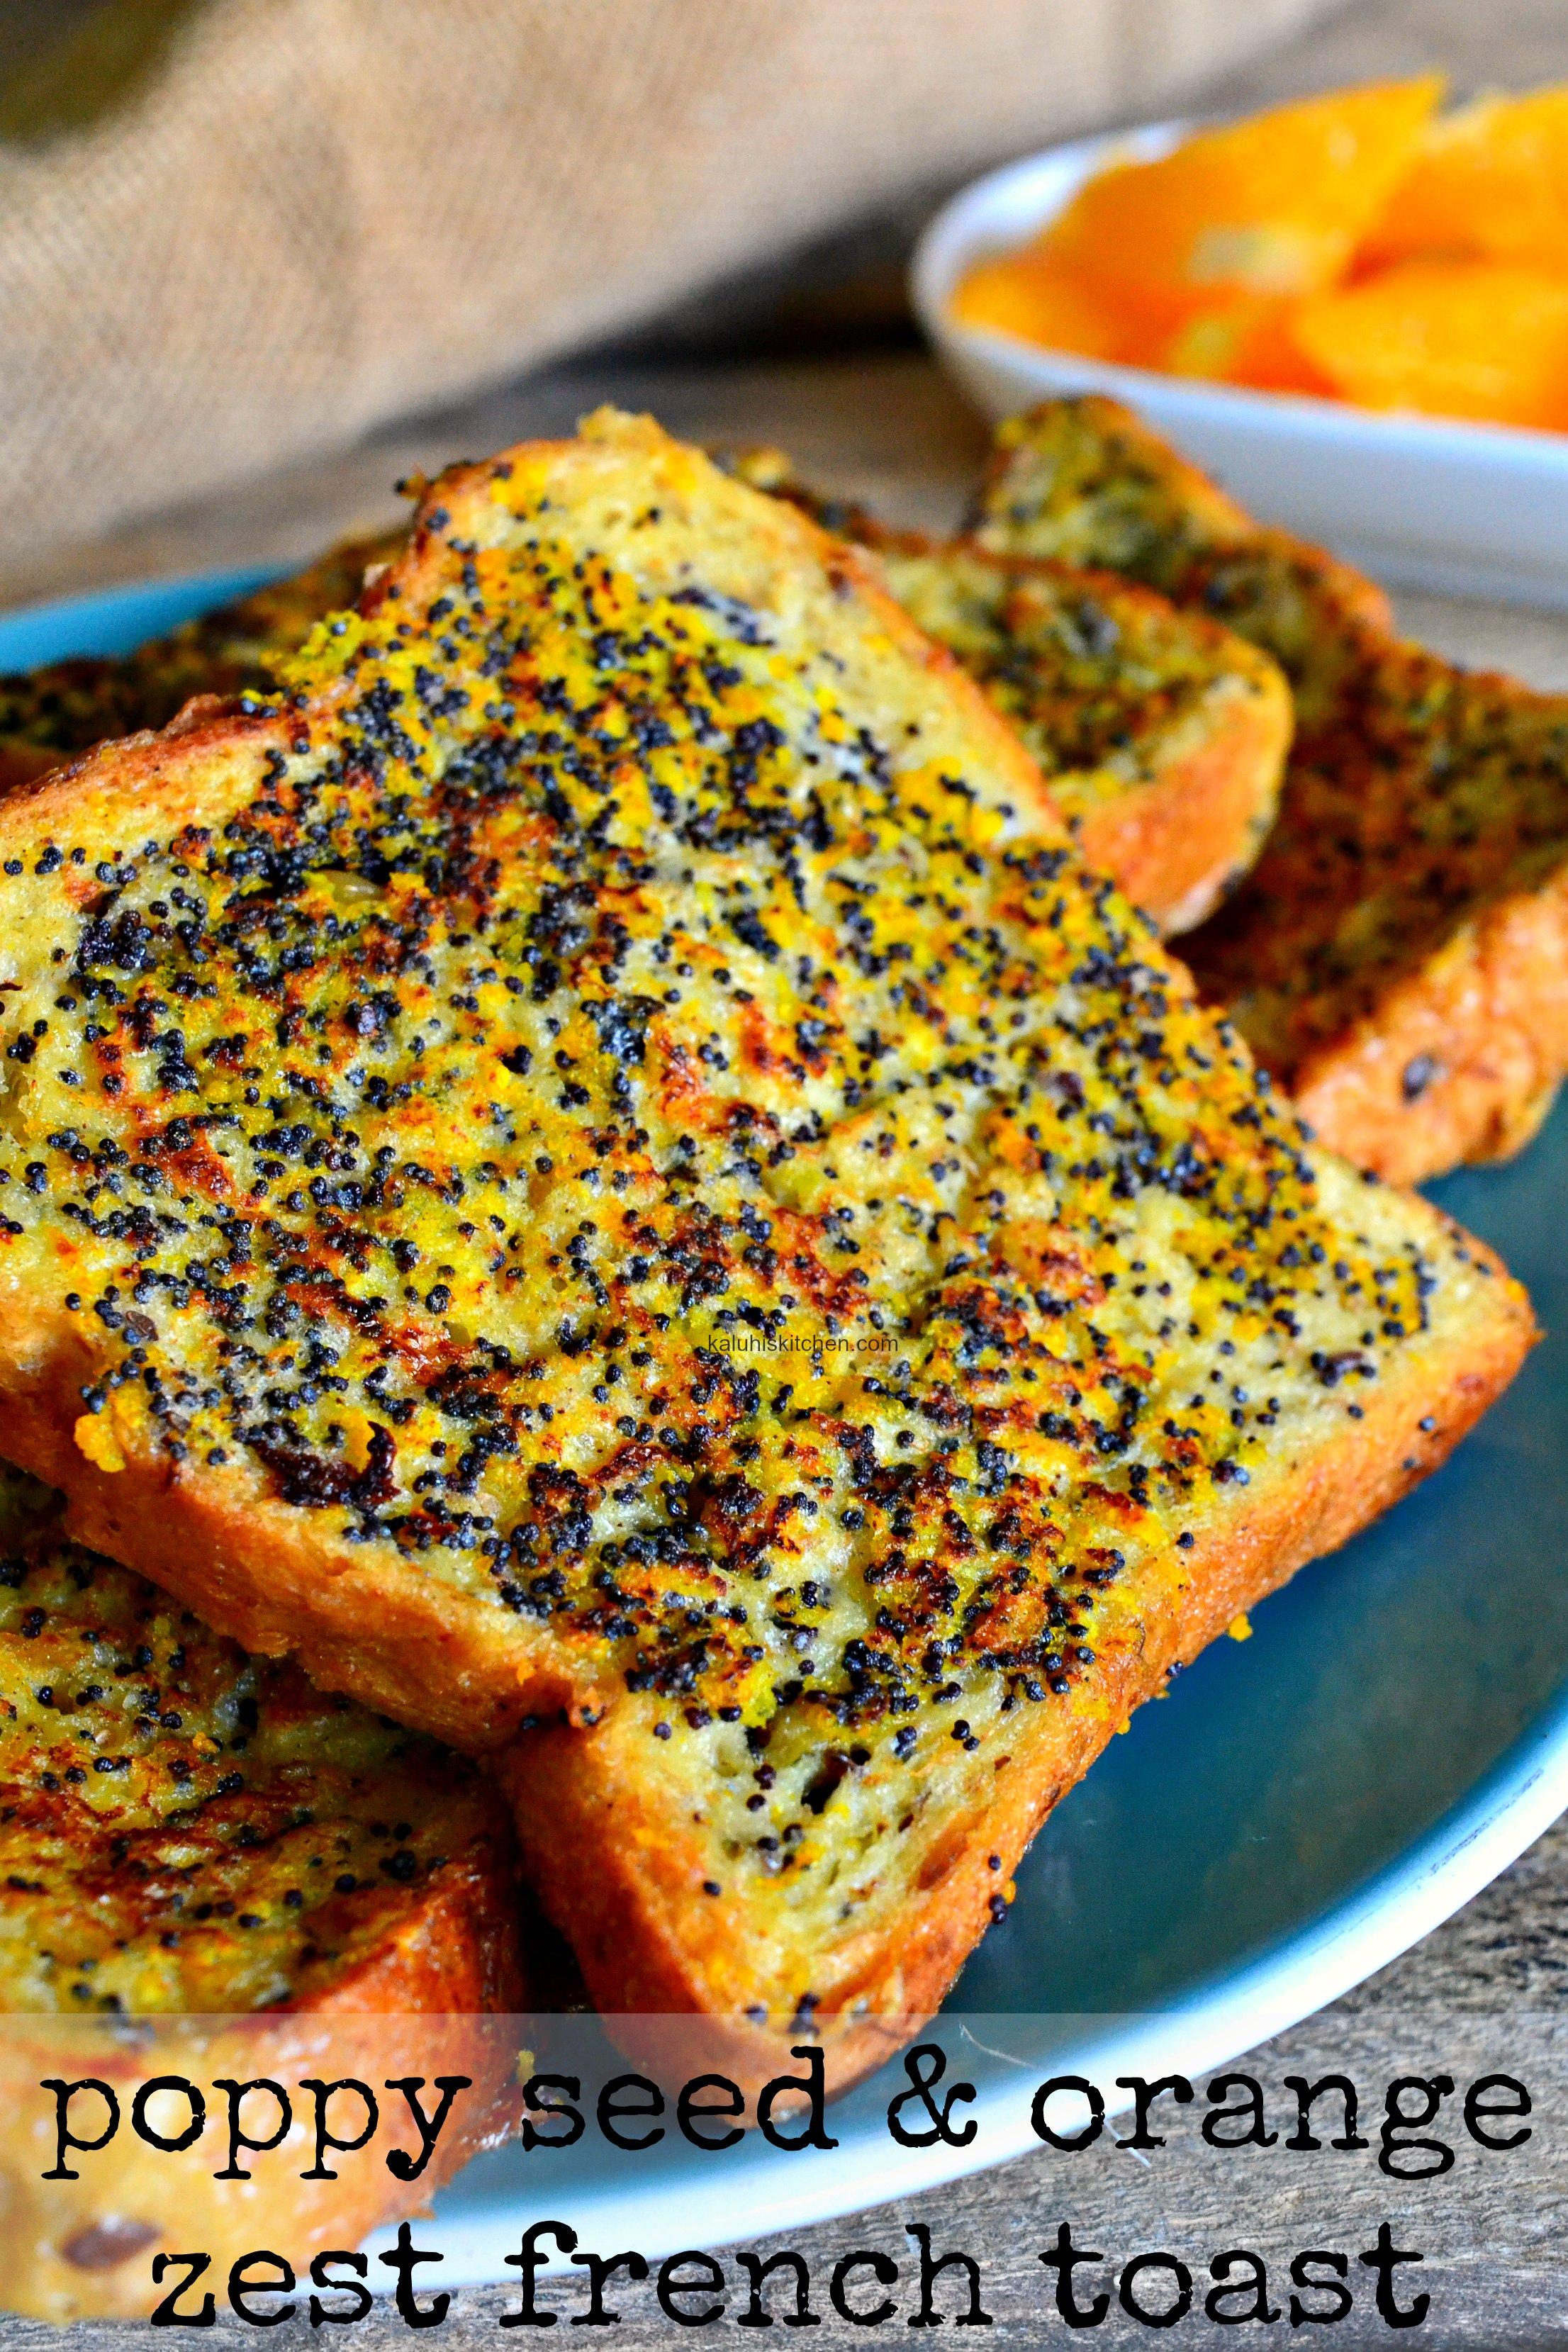 Poppy Seed And Orange Zest French Toastkaluhiskitchencomhow To